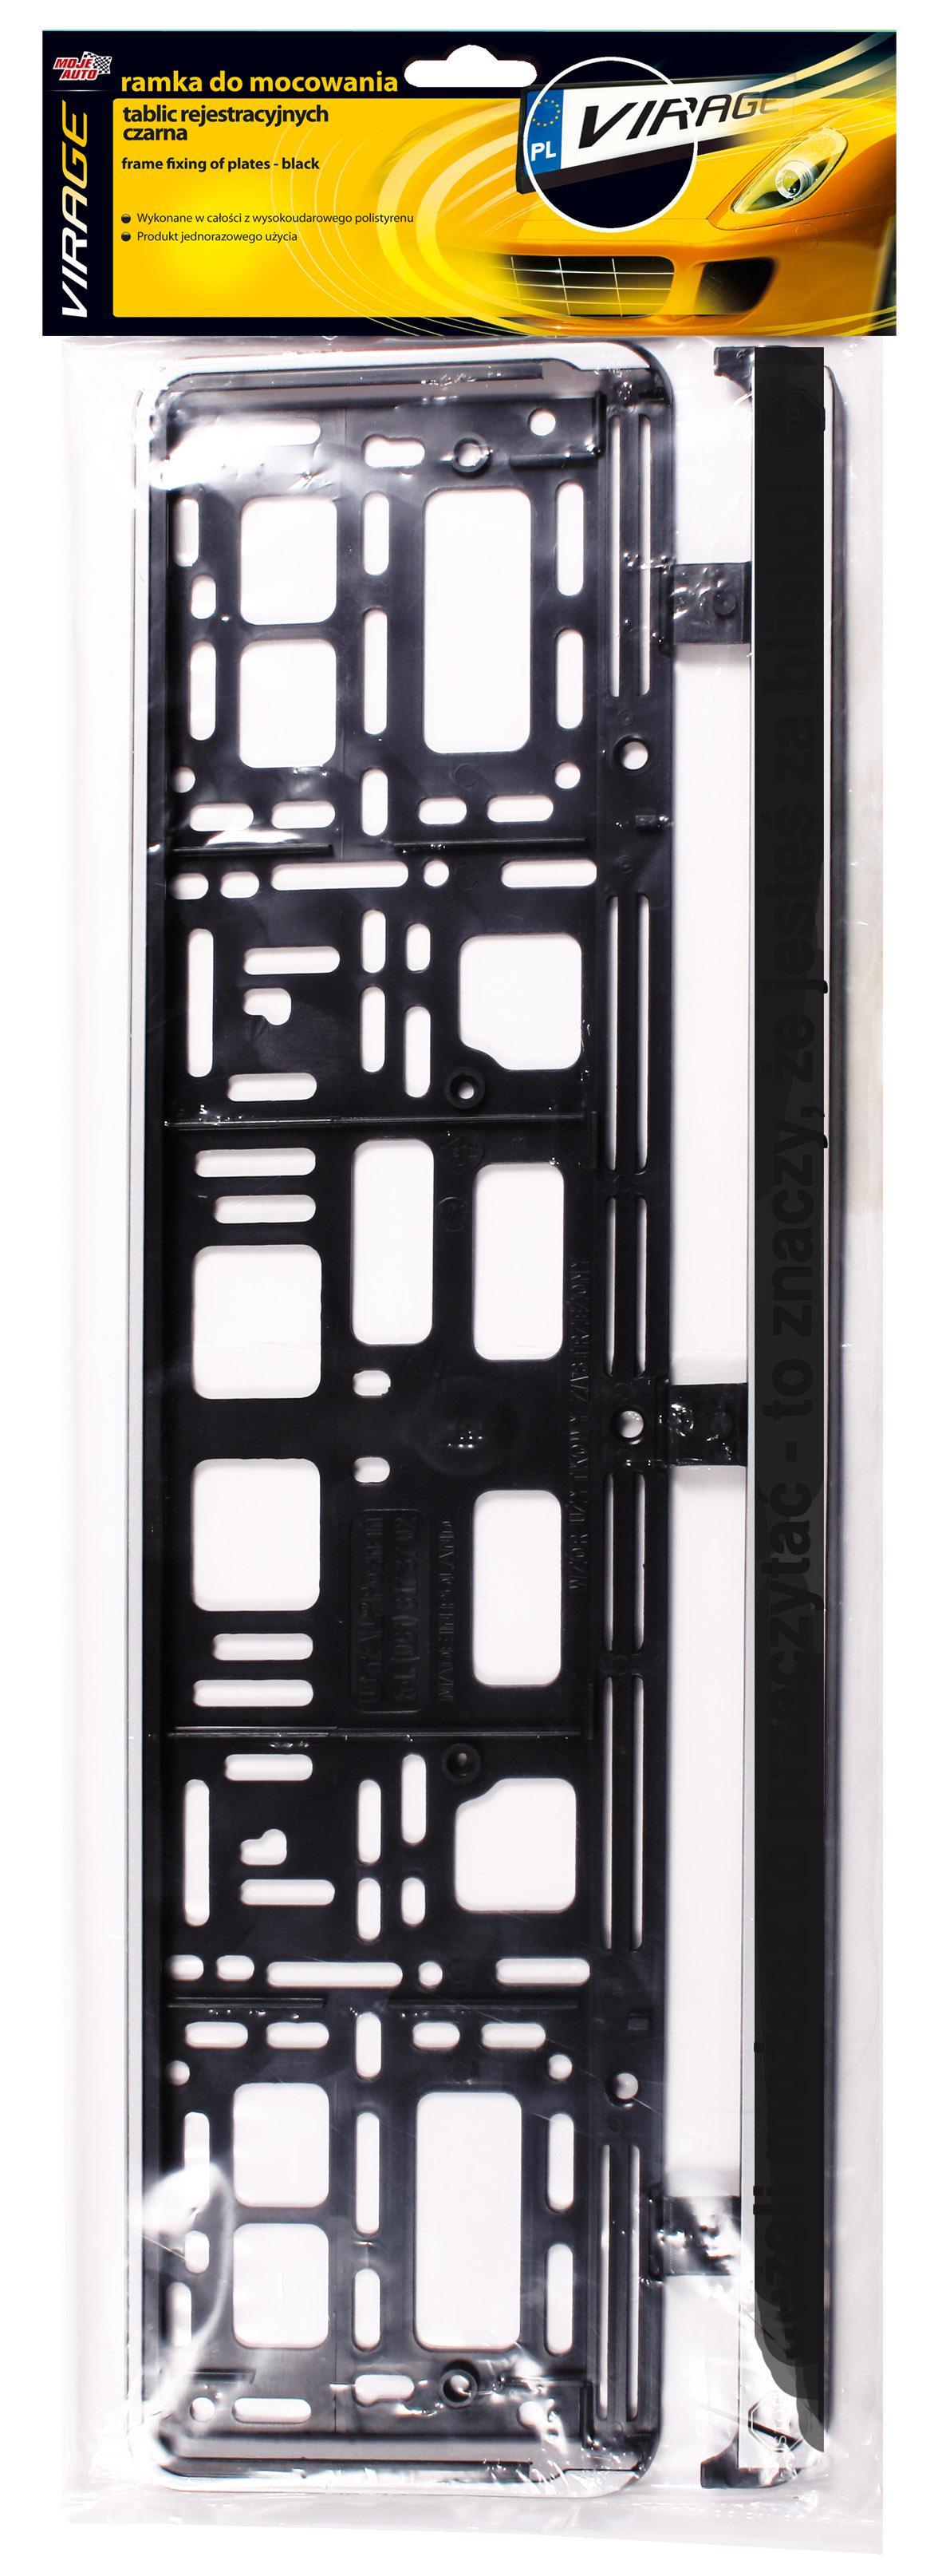 Porte plaques d'immatriculation VIRAGE 93-001 5905694010296